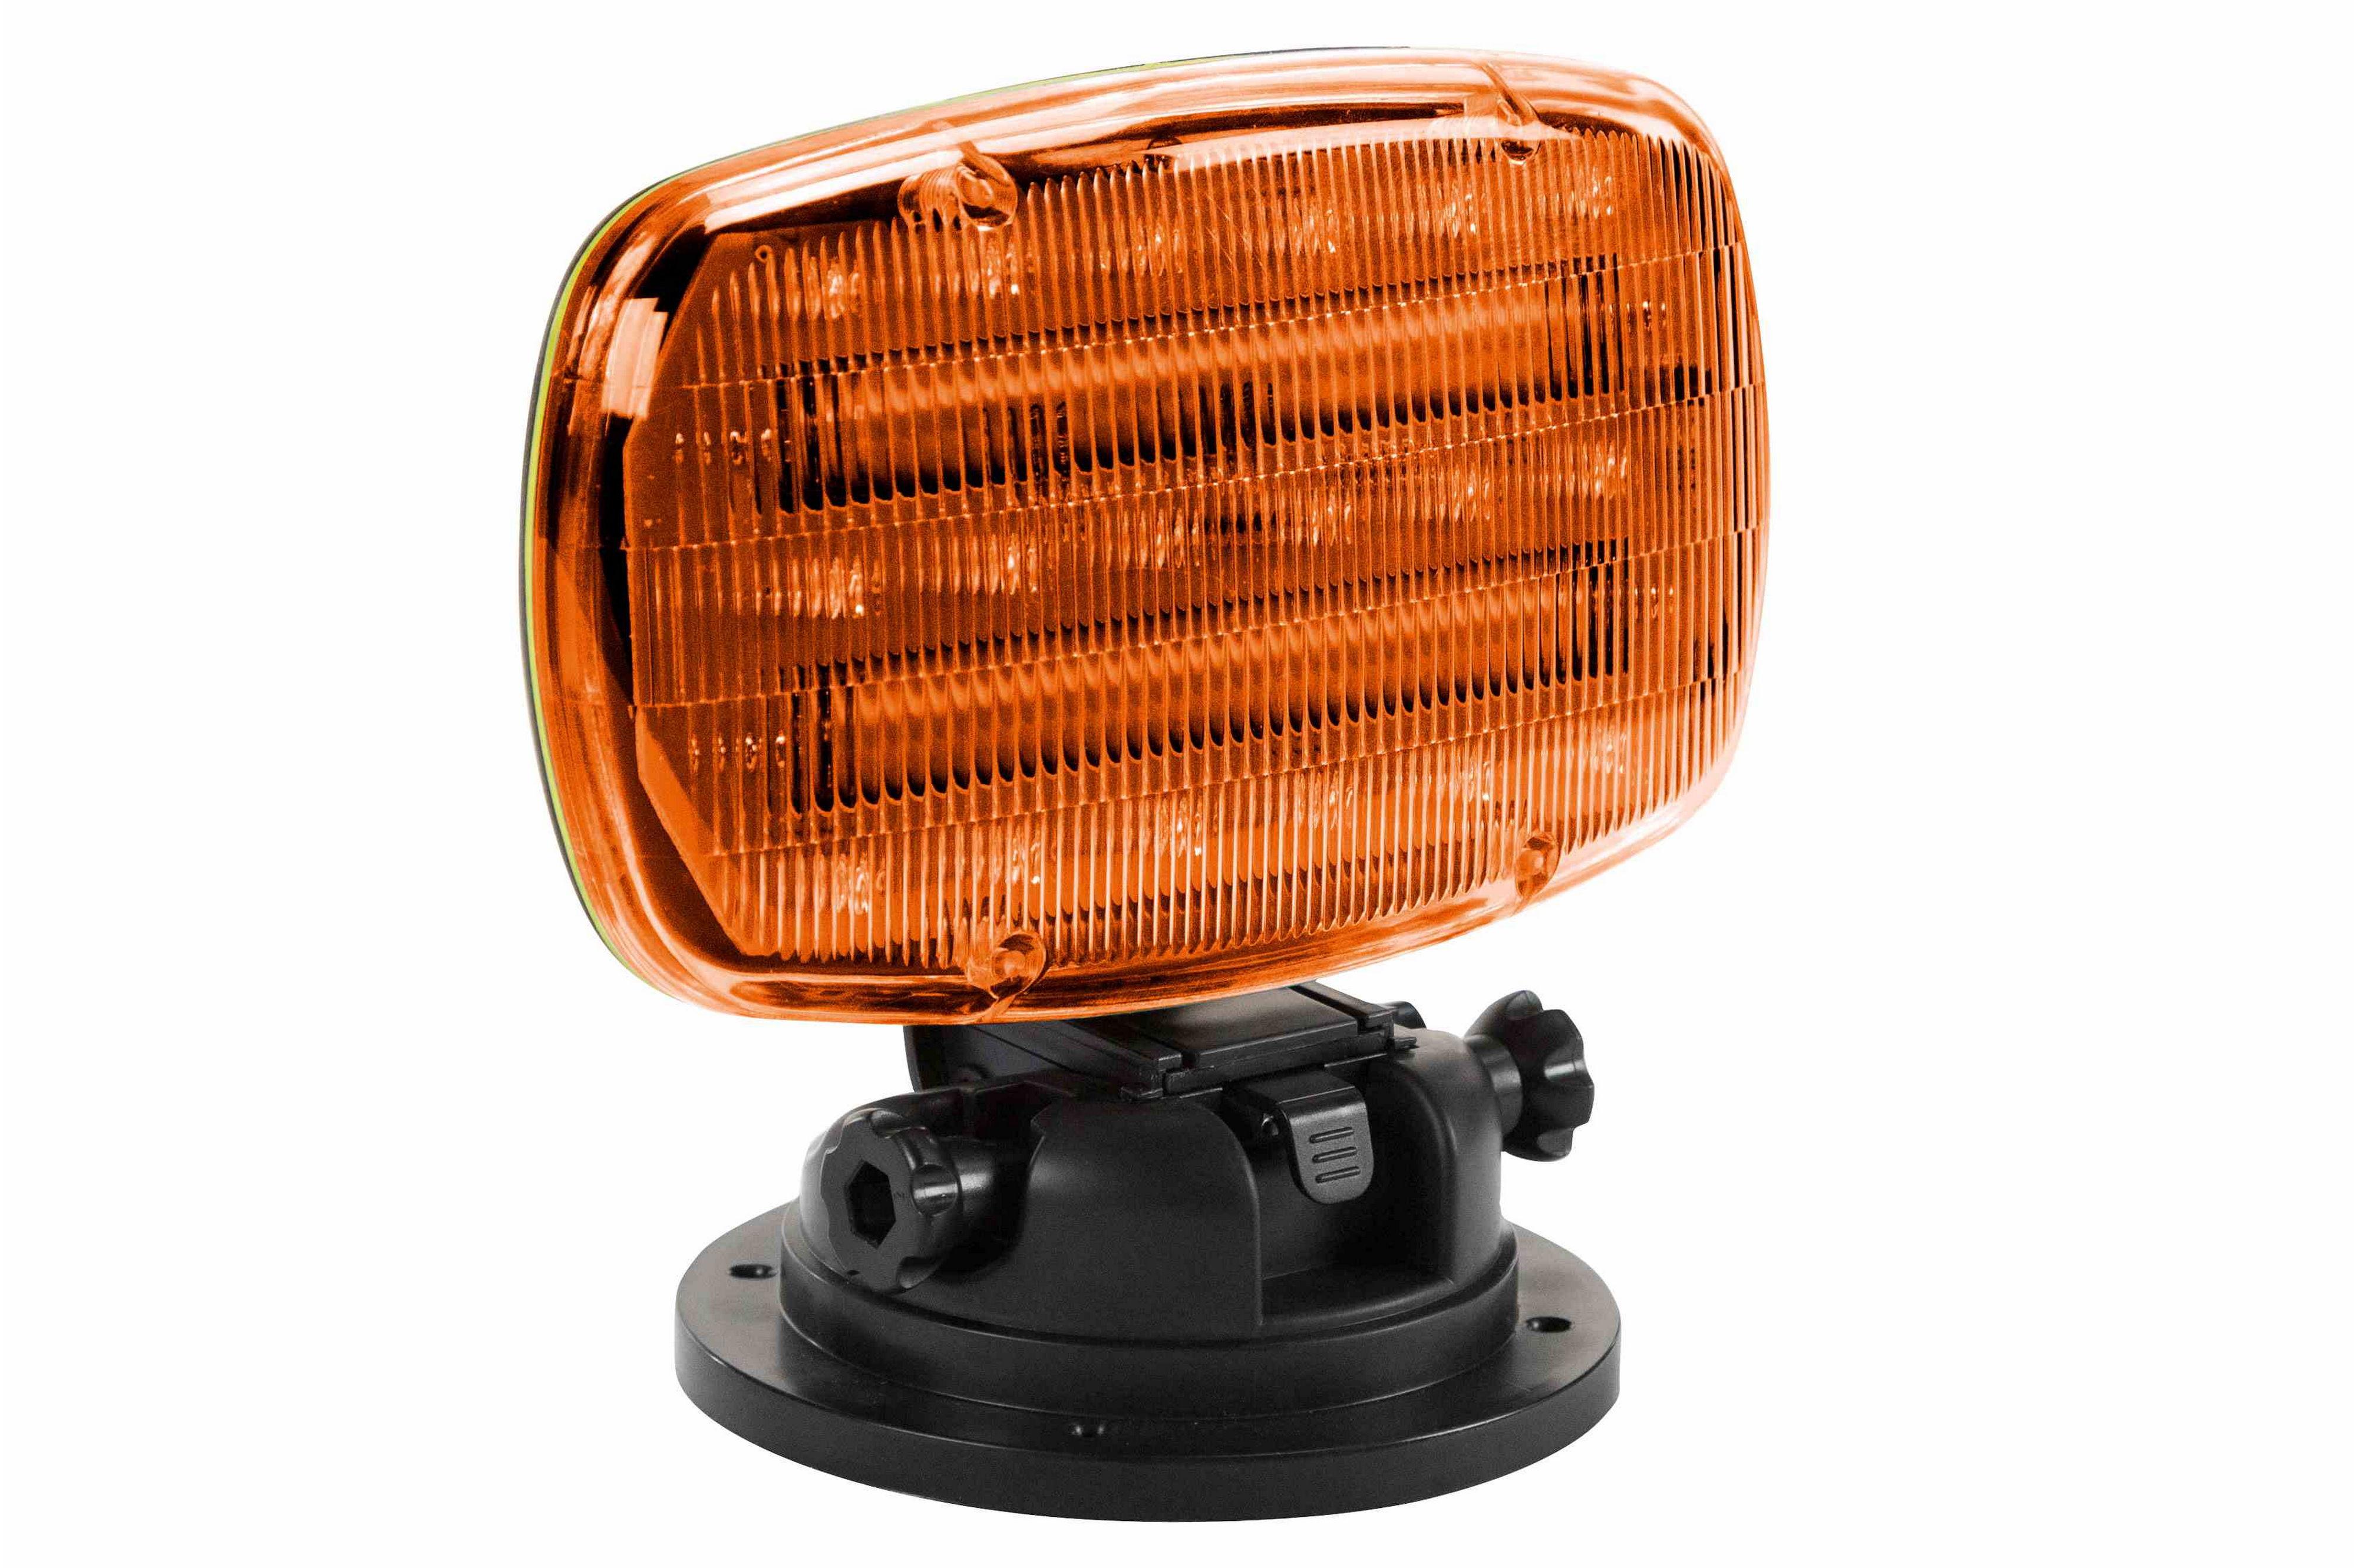 Light Equipment Transport : Led strobe light battery powered with adjustable locking